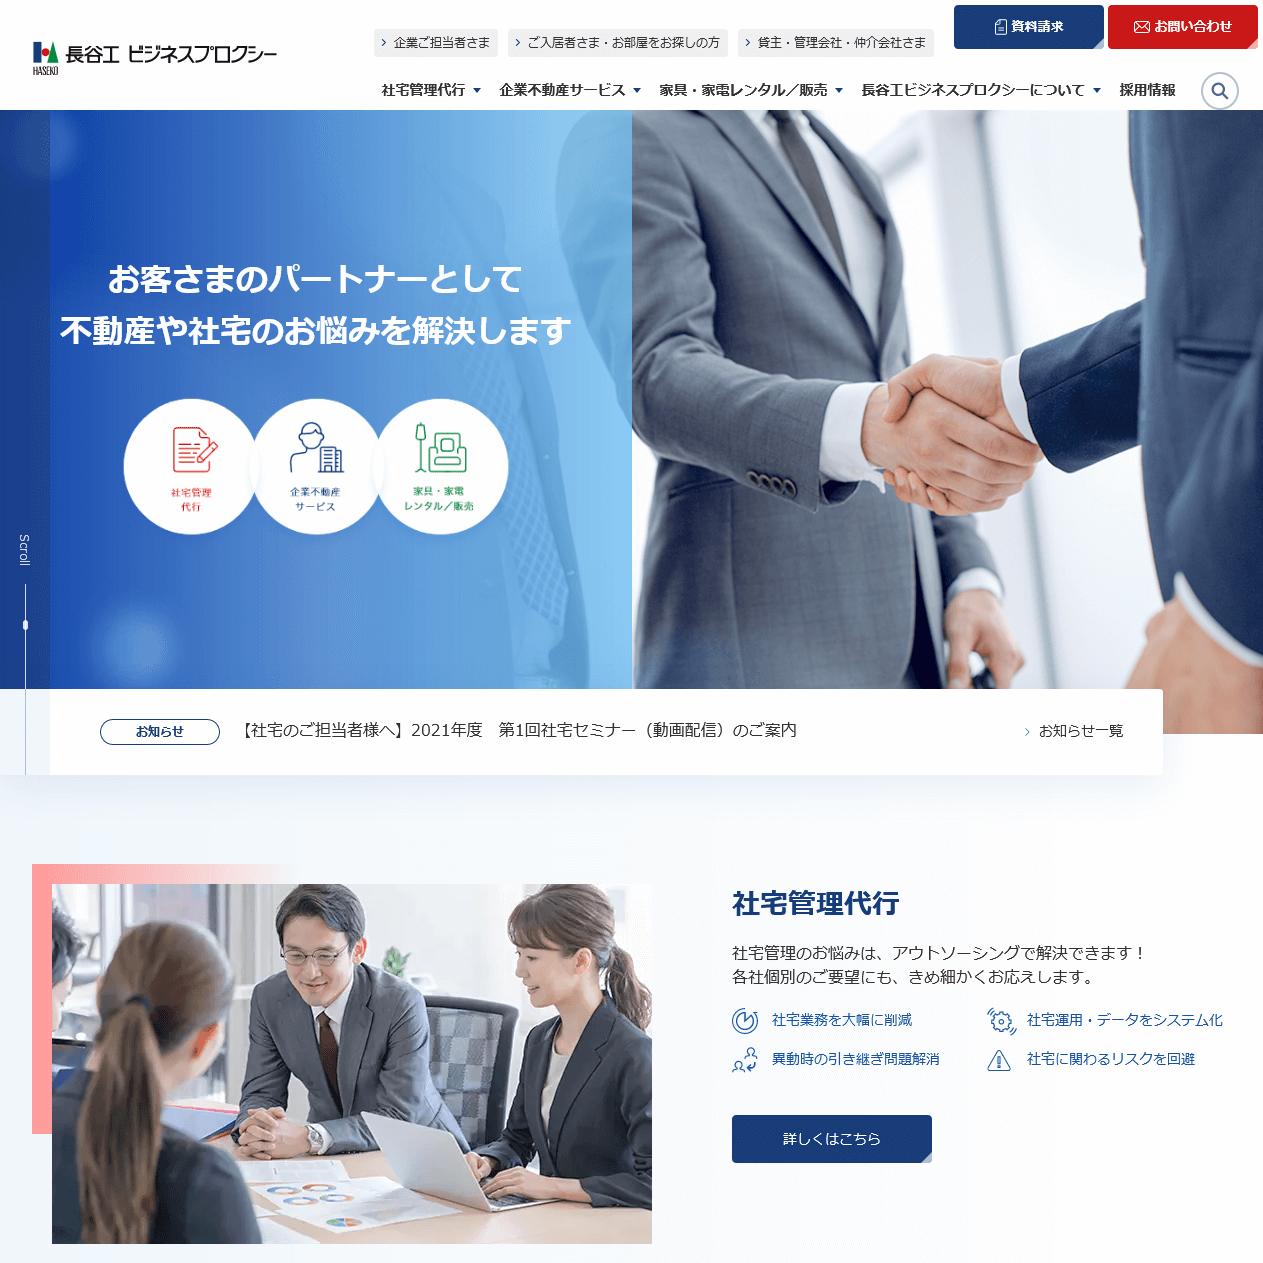 "<span class=""title"">株式会社長谷工ビジネスプロクシーの口コミや評判</span>"